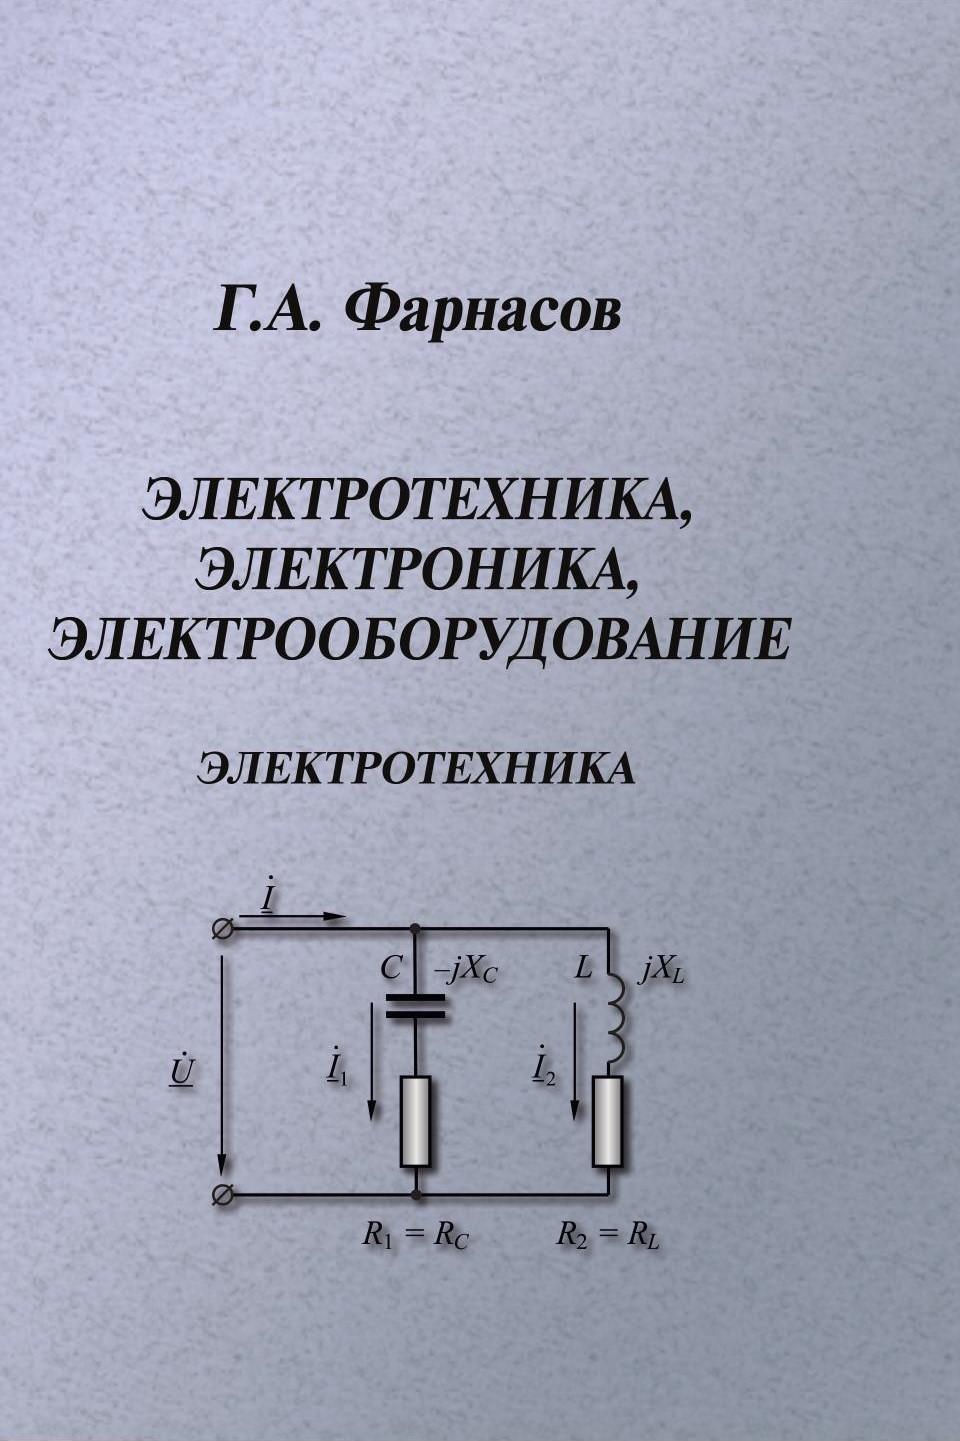 Геннадий Фарнасов Электротехника, электроника, электрооборудование. Электротехника